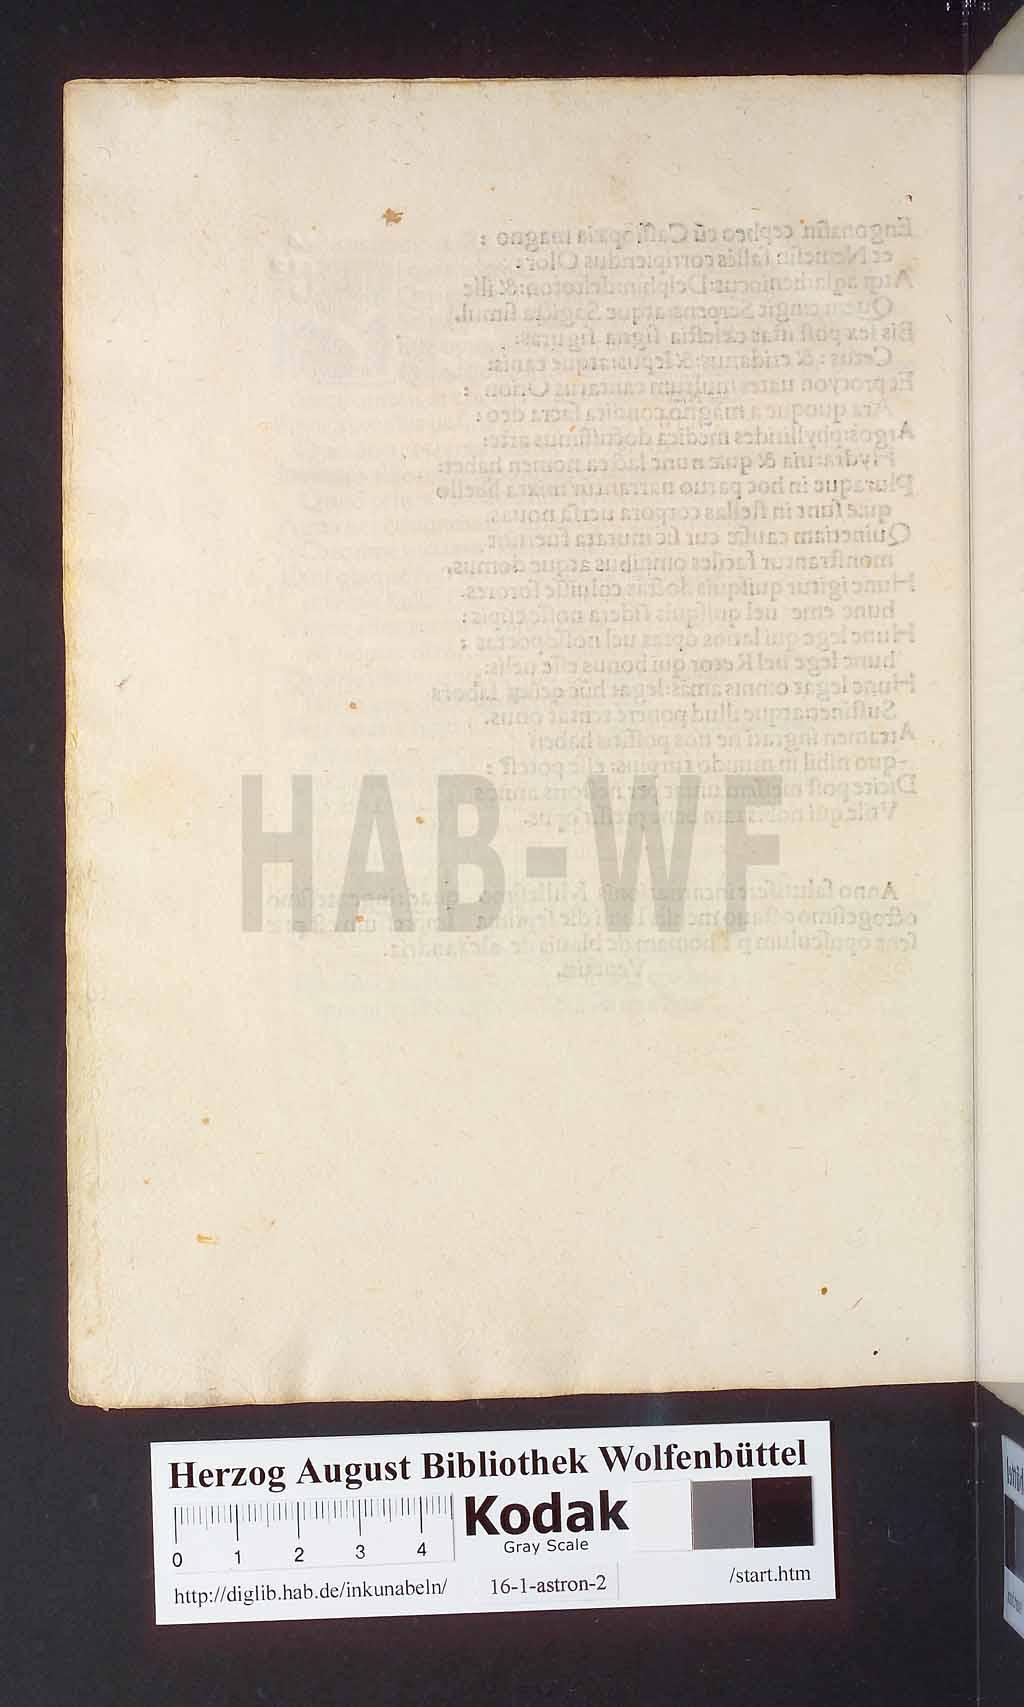 http://diglib.hab.de/inkunabeln/16-1-astron-2/00112.jpg